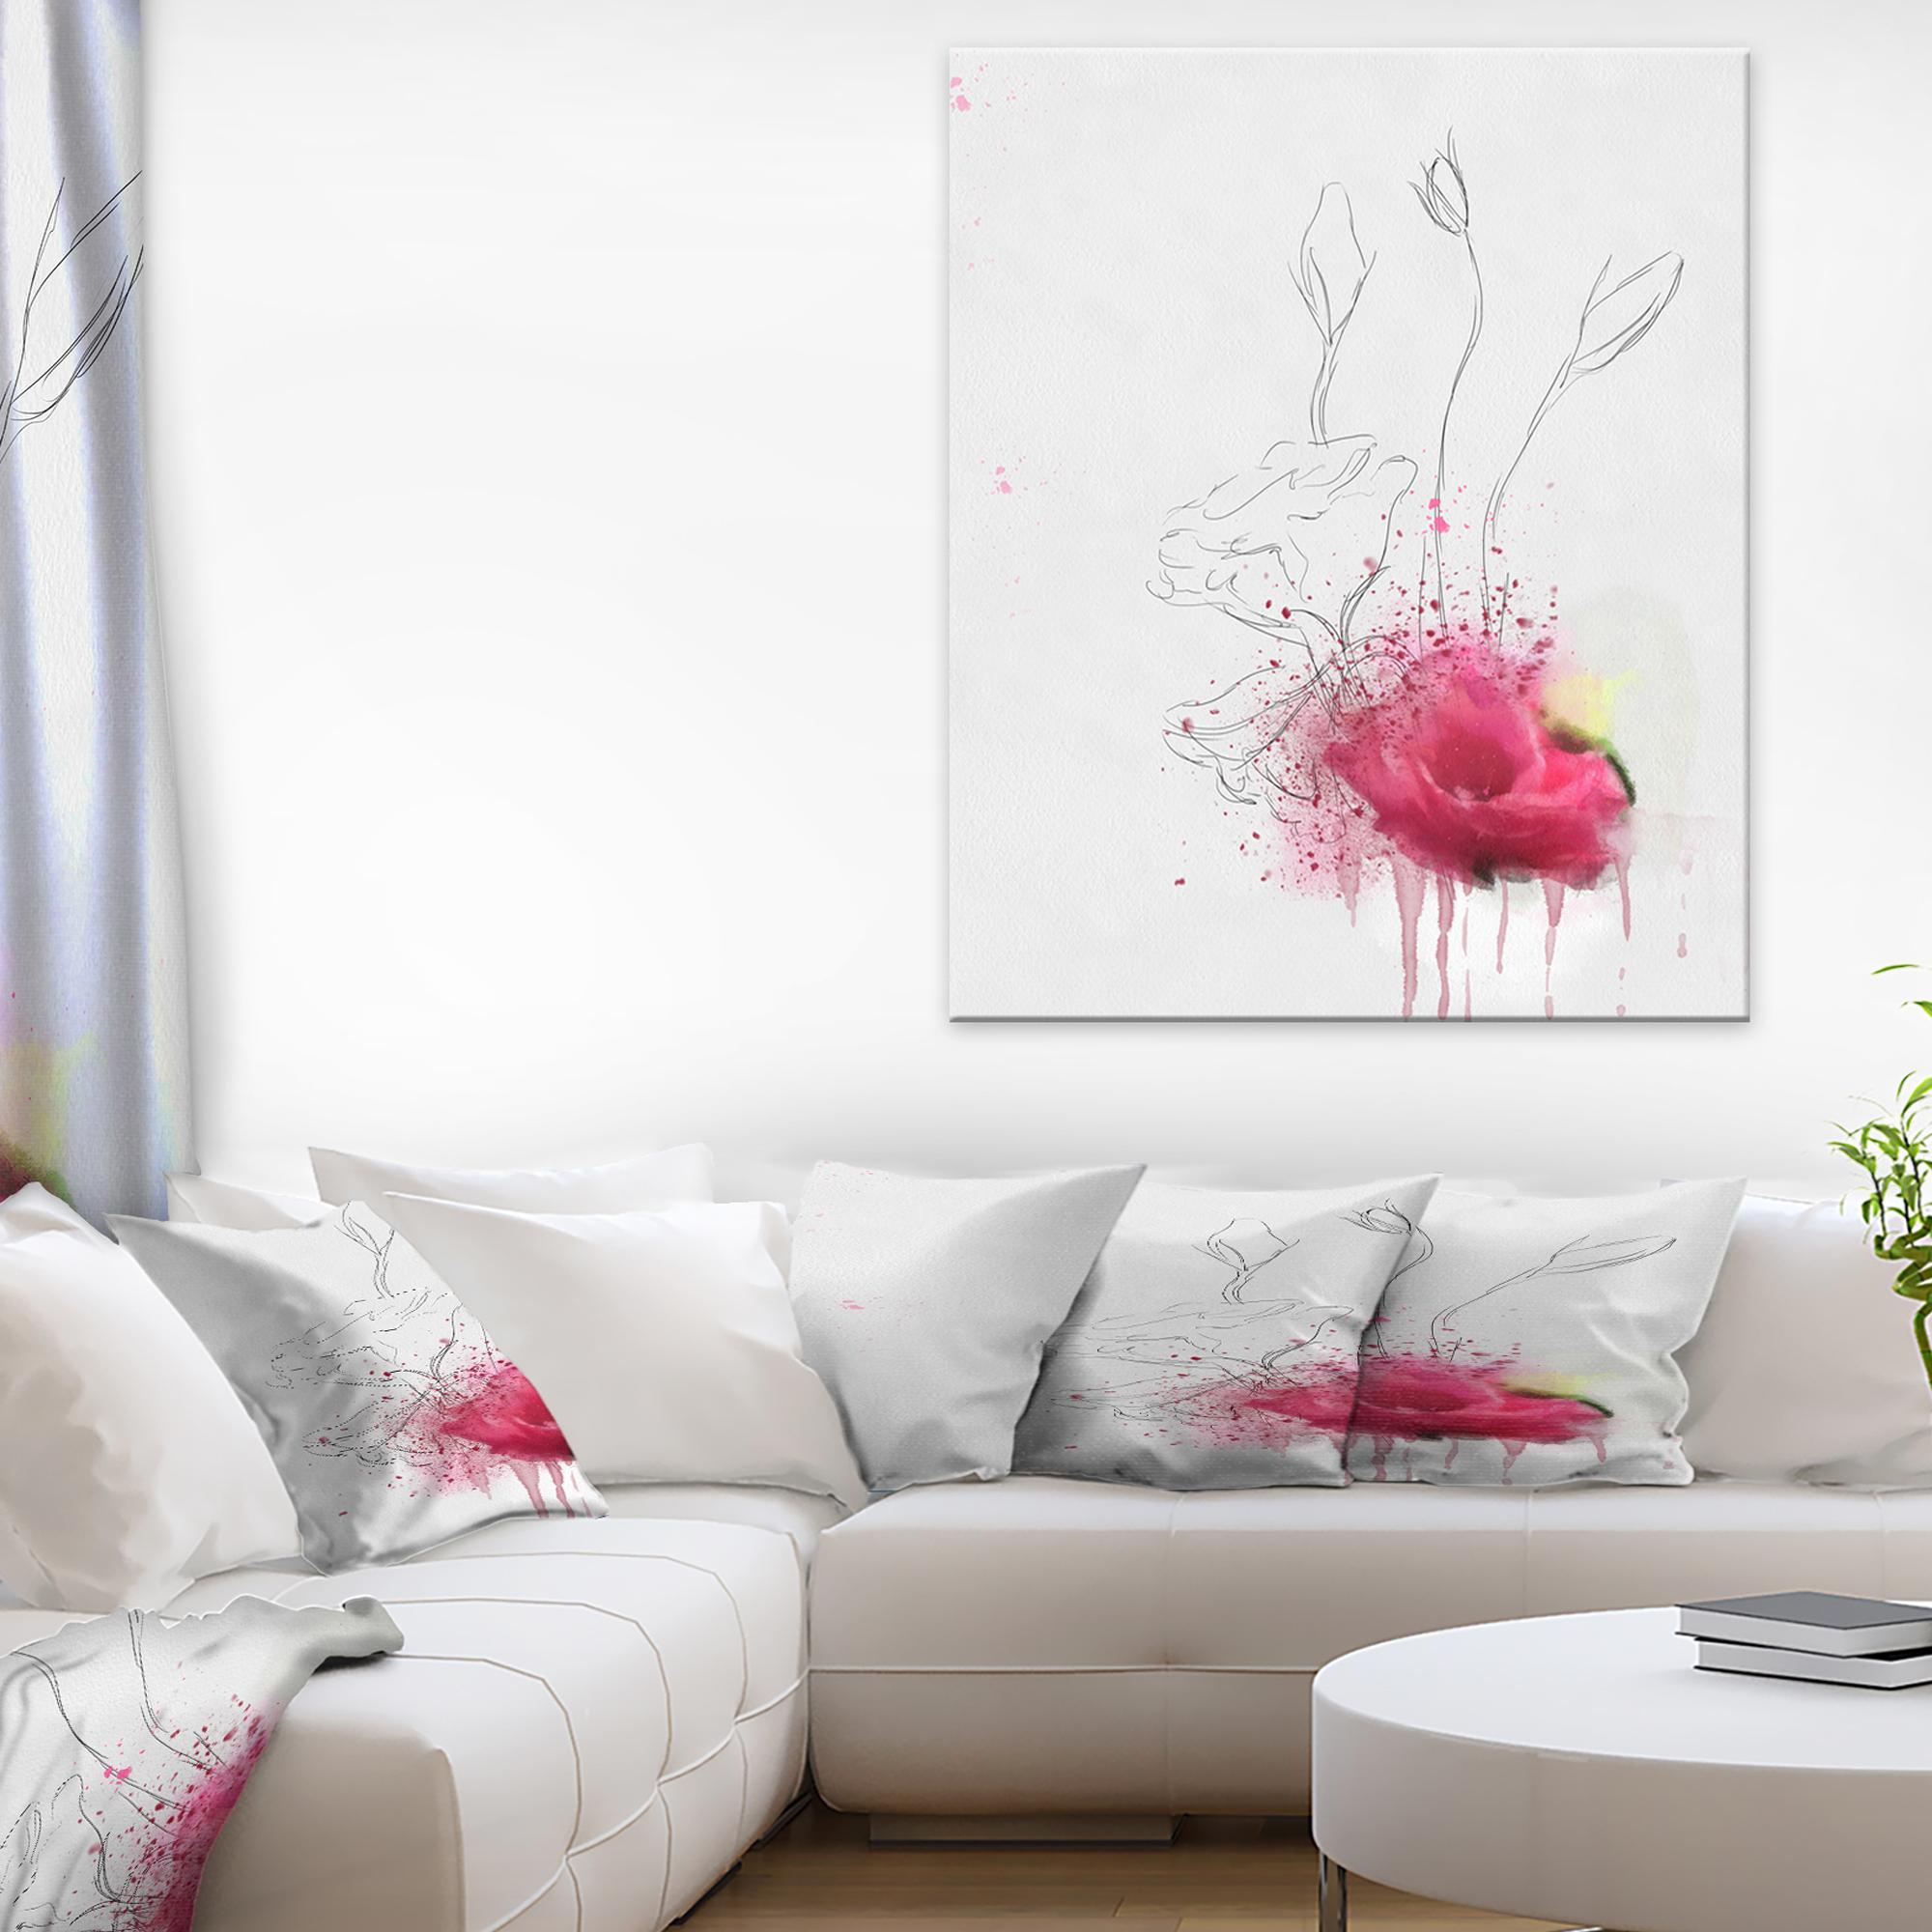 Rose Flowers Sketch with Color Splashes - Floral Canvas Art Print - image 3 de 3